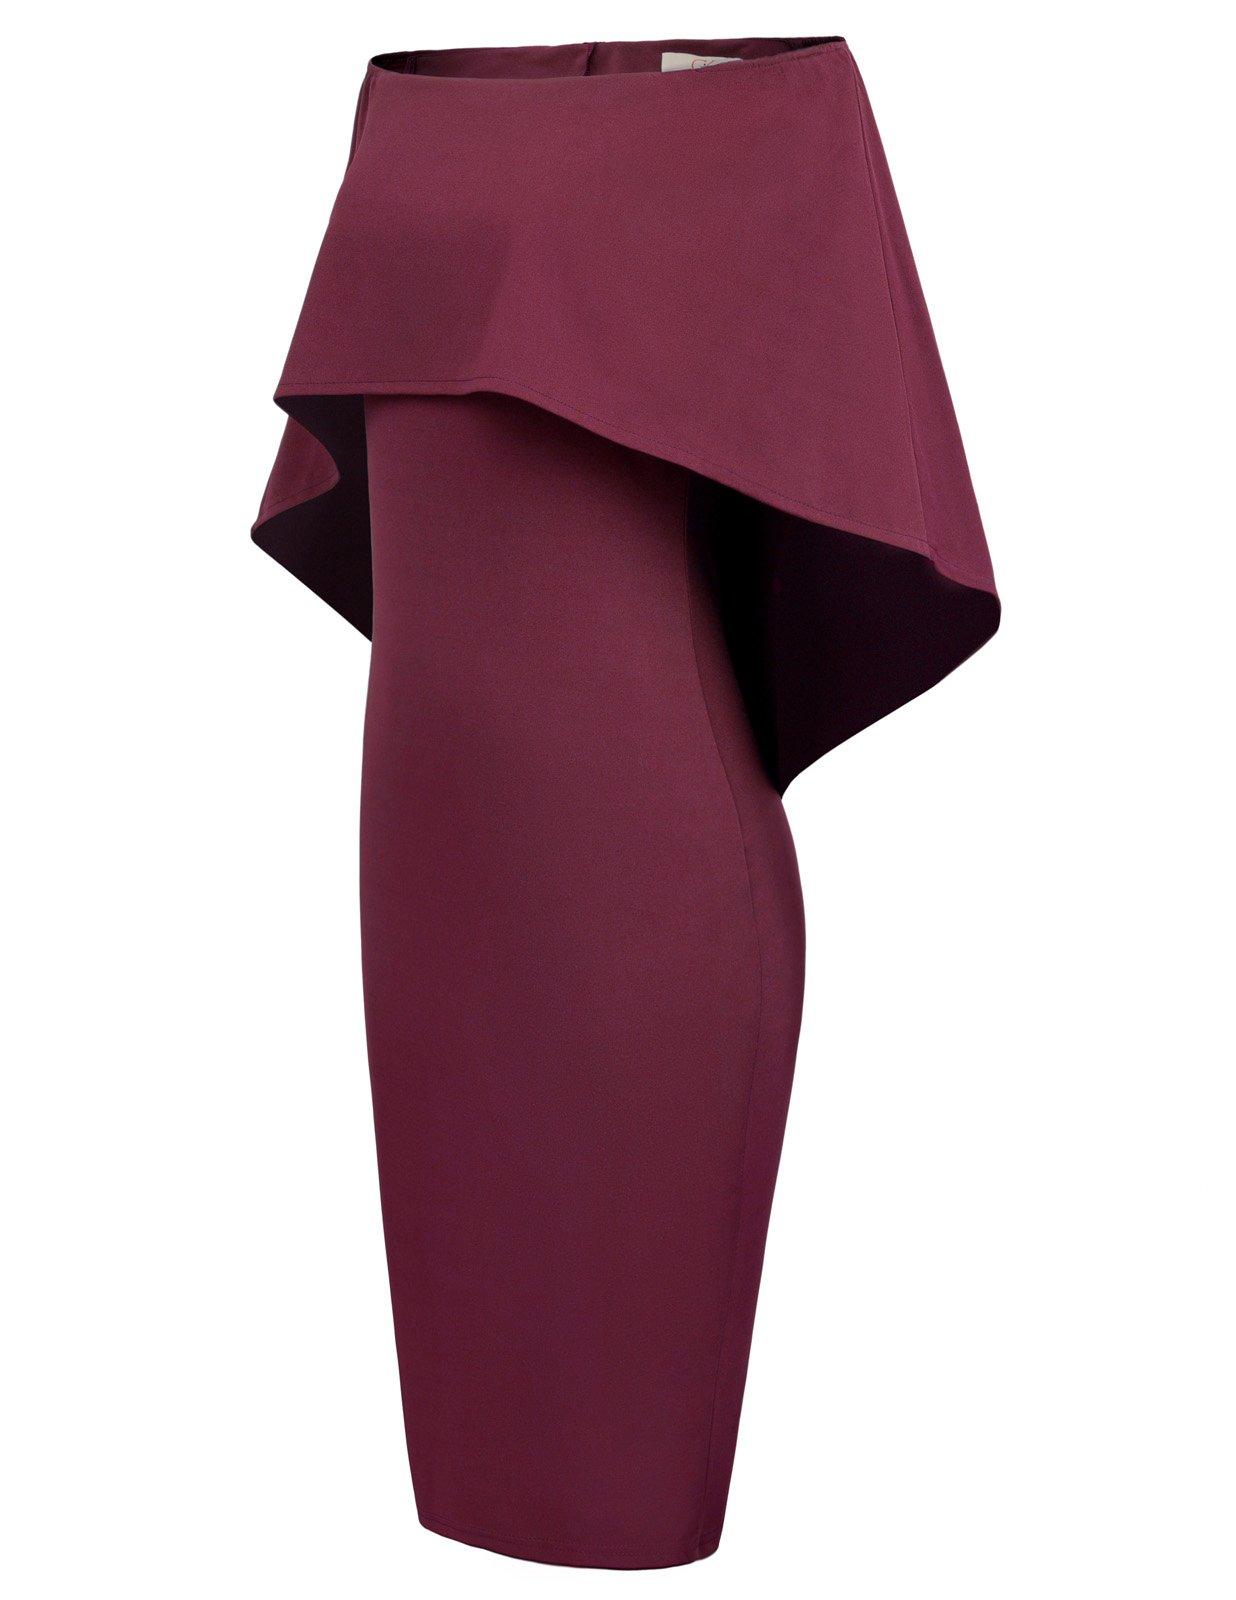 4f1eadedc4 GRACE KARIN Women Off Shoulder Batwing Cape Midi Dress. by GRACE KARIN. GRACE  KARIN Women Knee Length ...